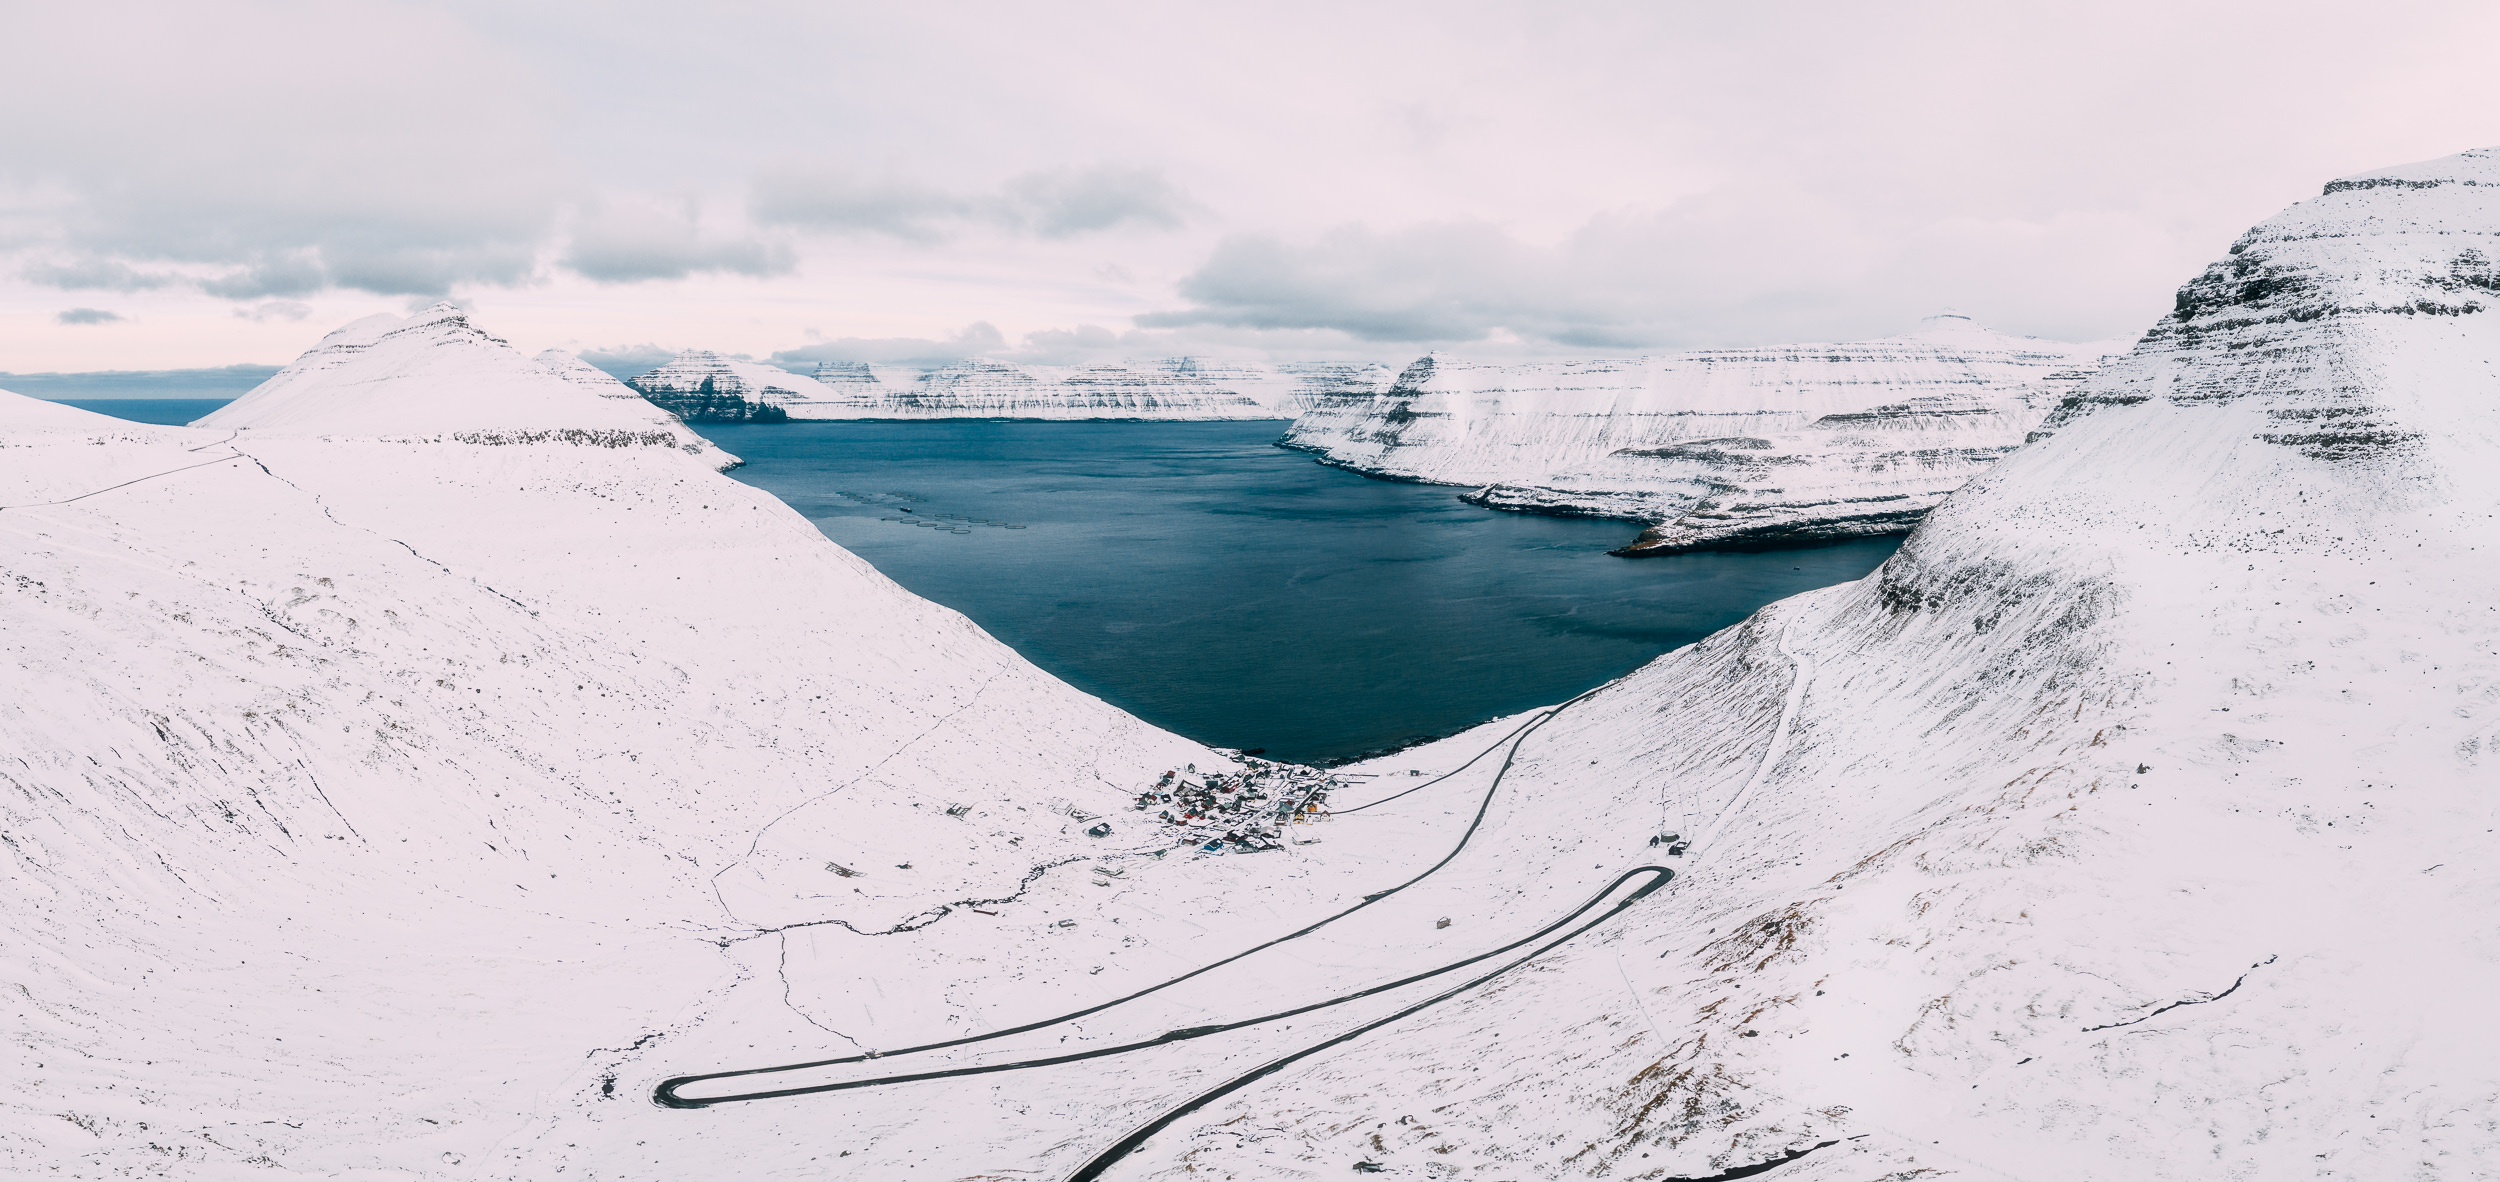 2019.02.05_Faroe_Gjogv_Mavic-0001-15-Pano-Edit.jpg